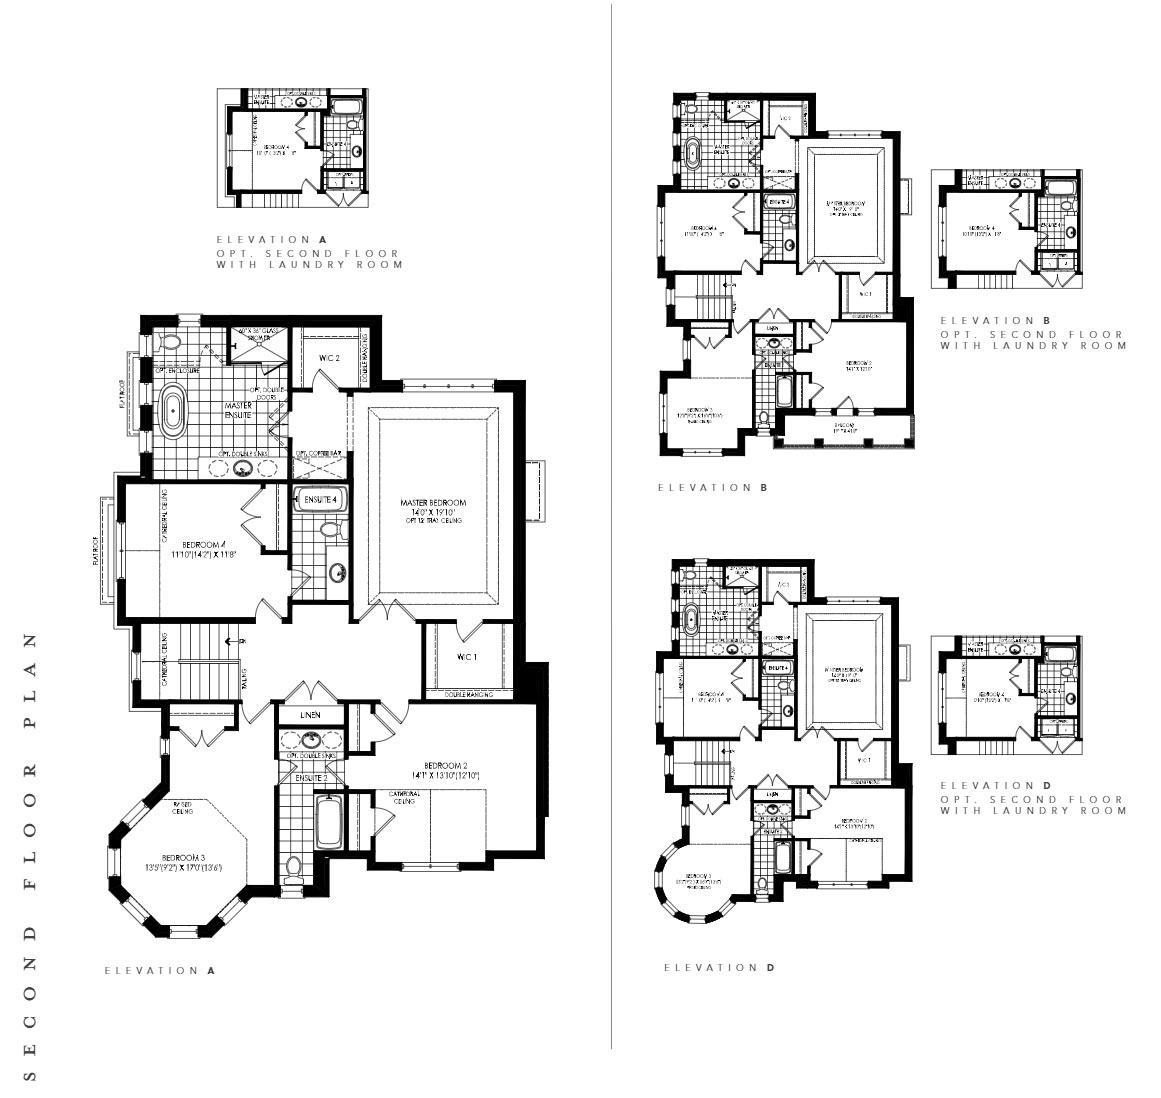 Lot 59 - Lockton B Floorplan 2